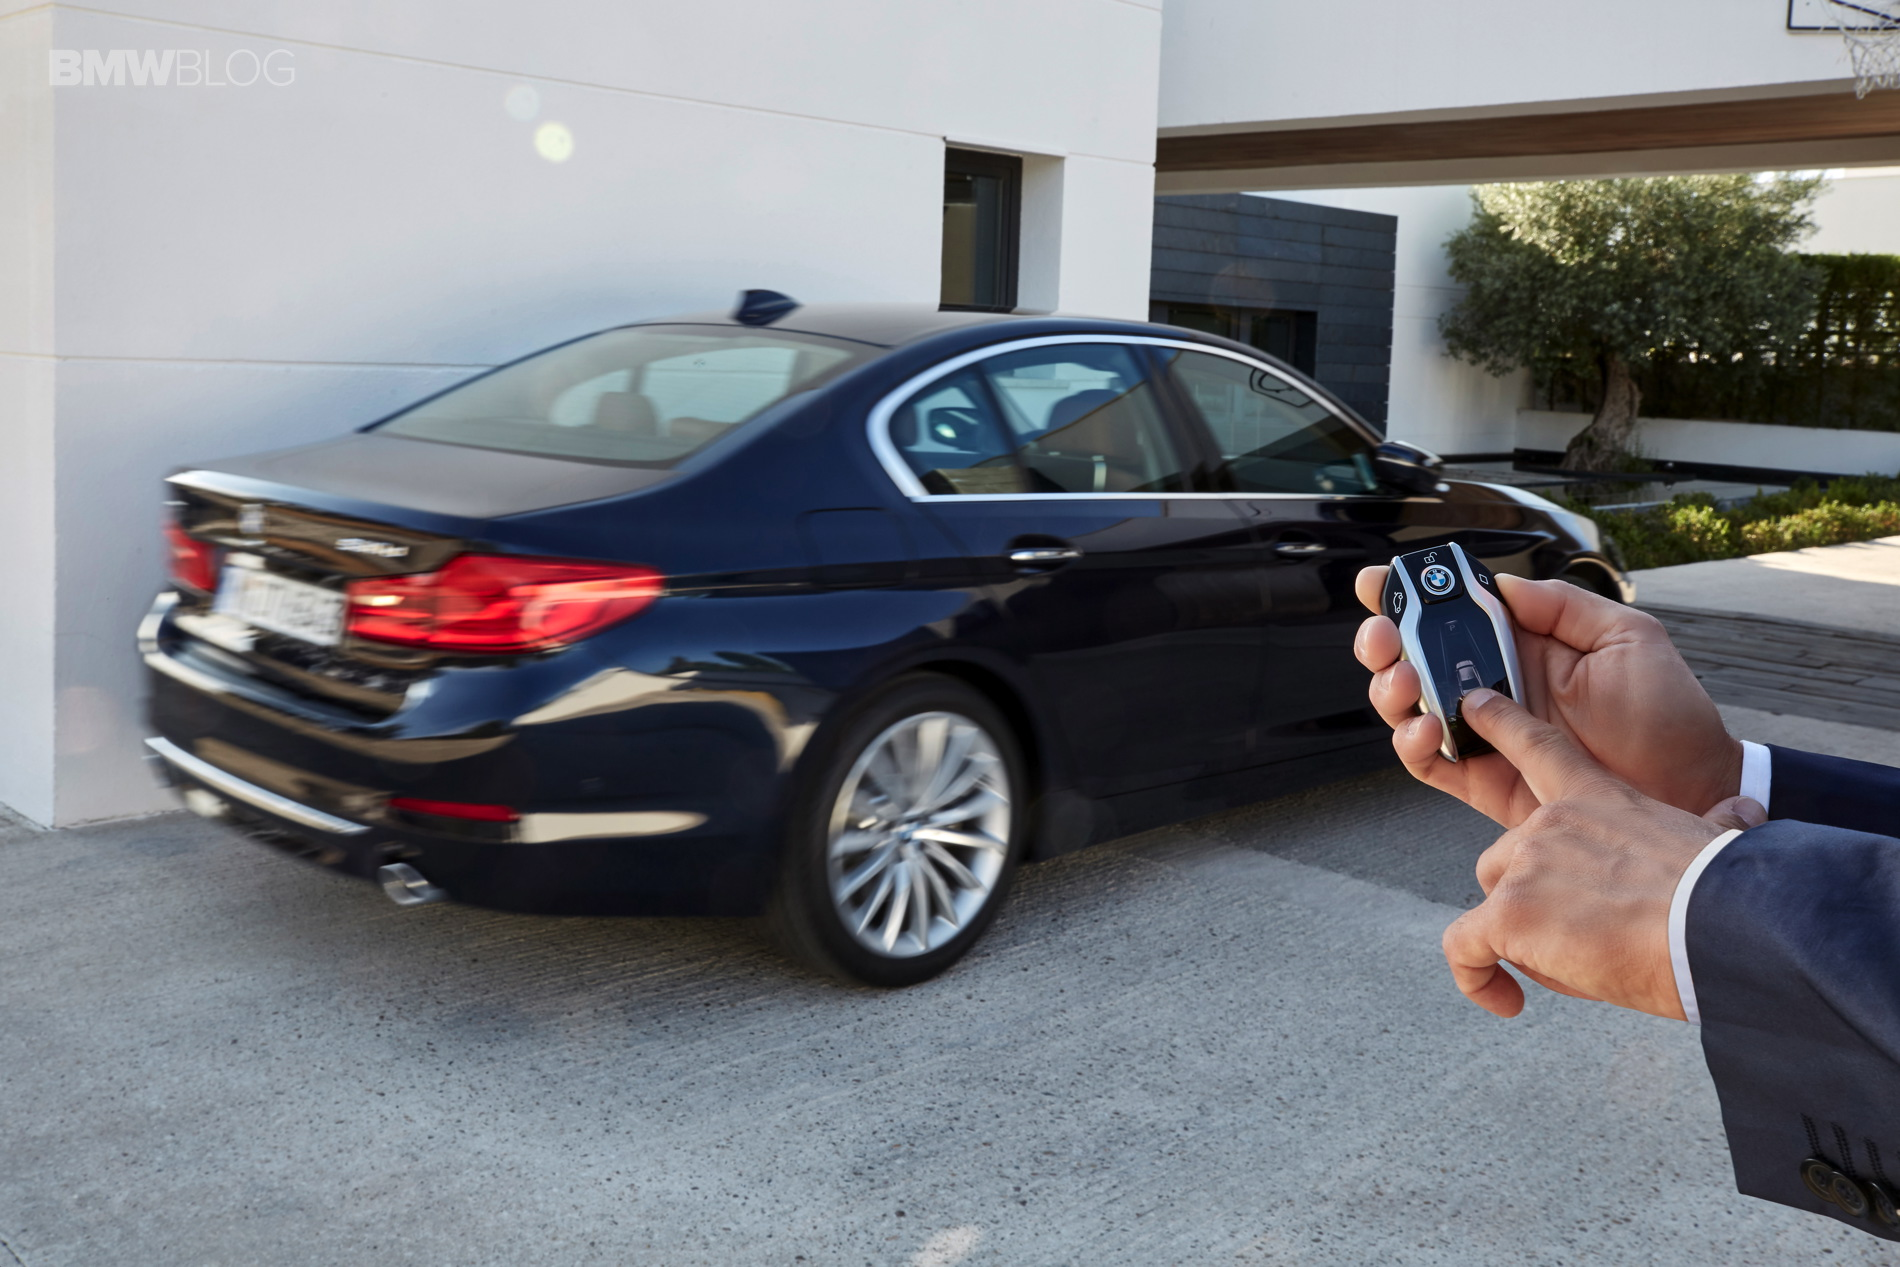 BMW G30 5 Series Luxury Line exterior 1